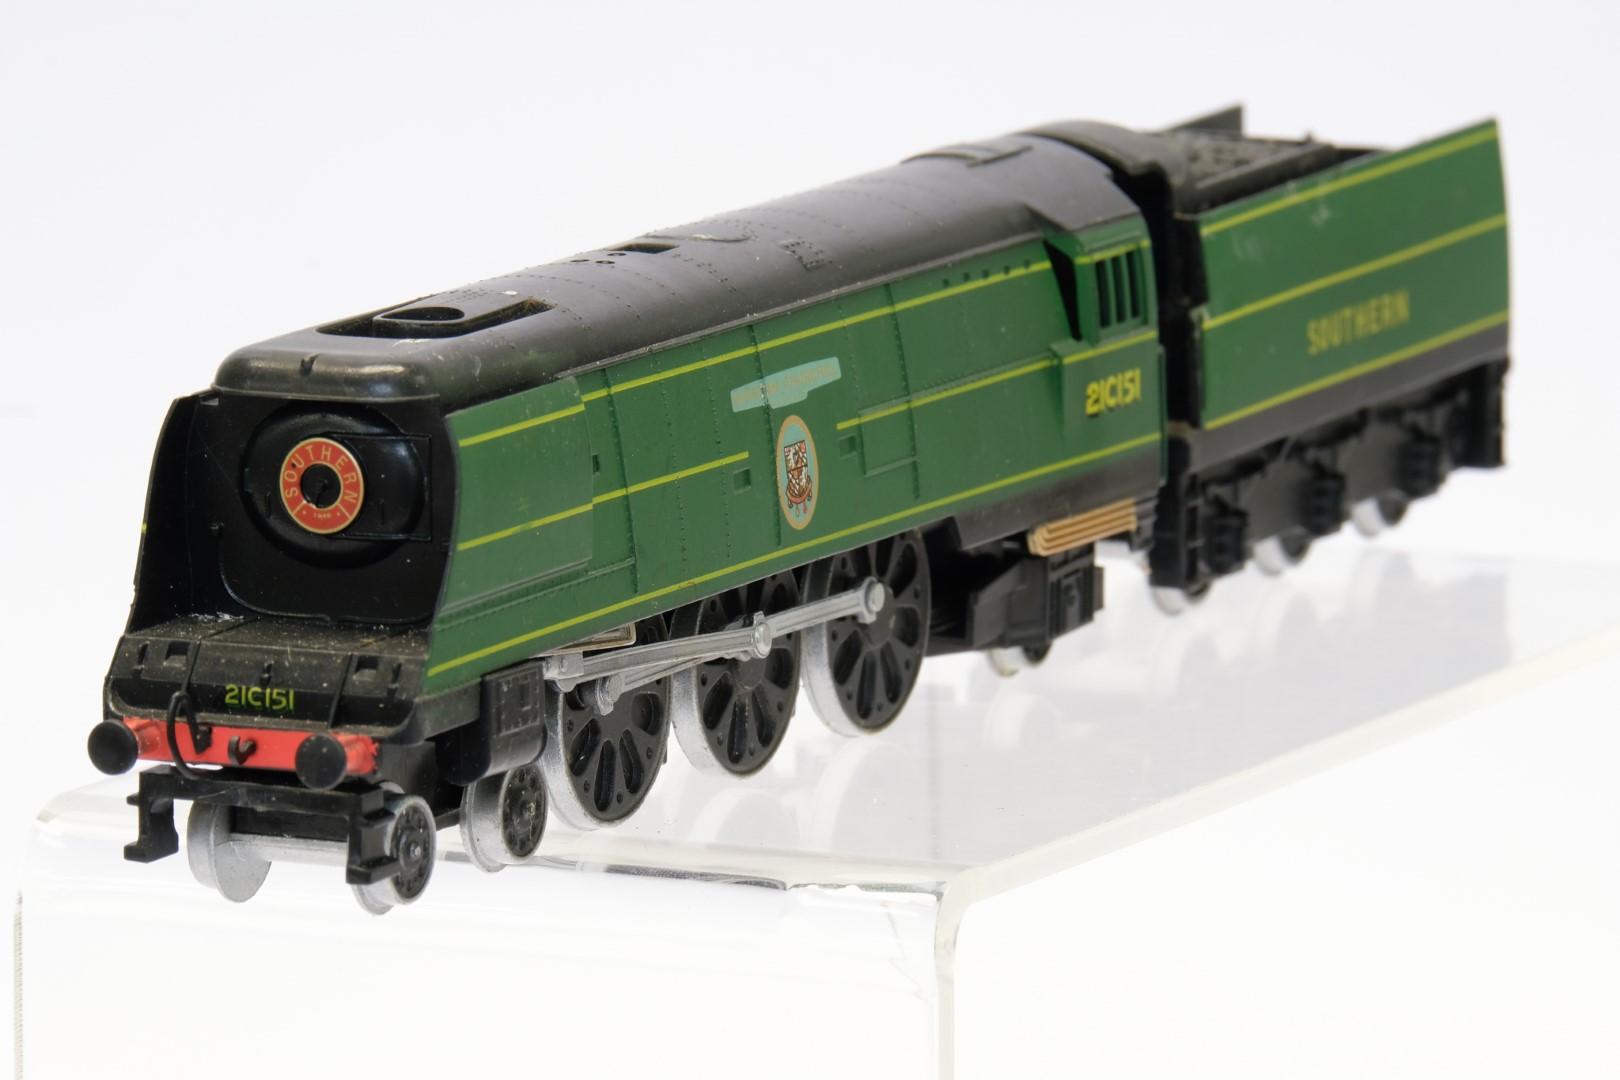 Winston Churchill Locomotive and Tender 21C151 - No Box - No Moving Parts - Image 2 of 4